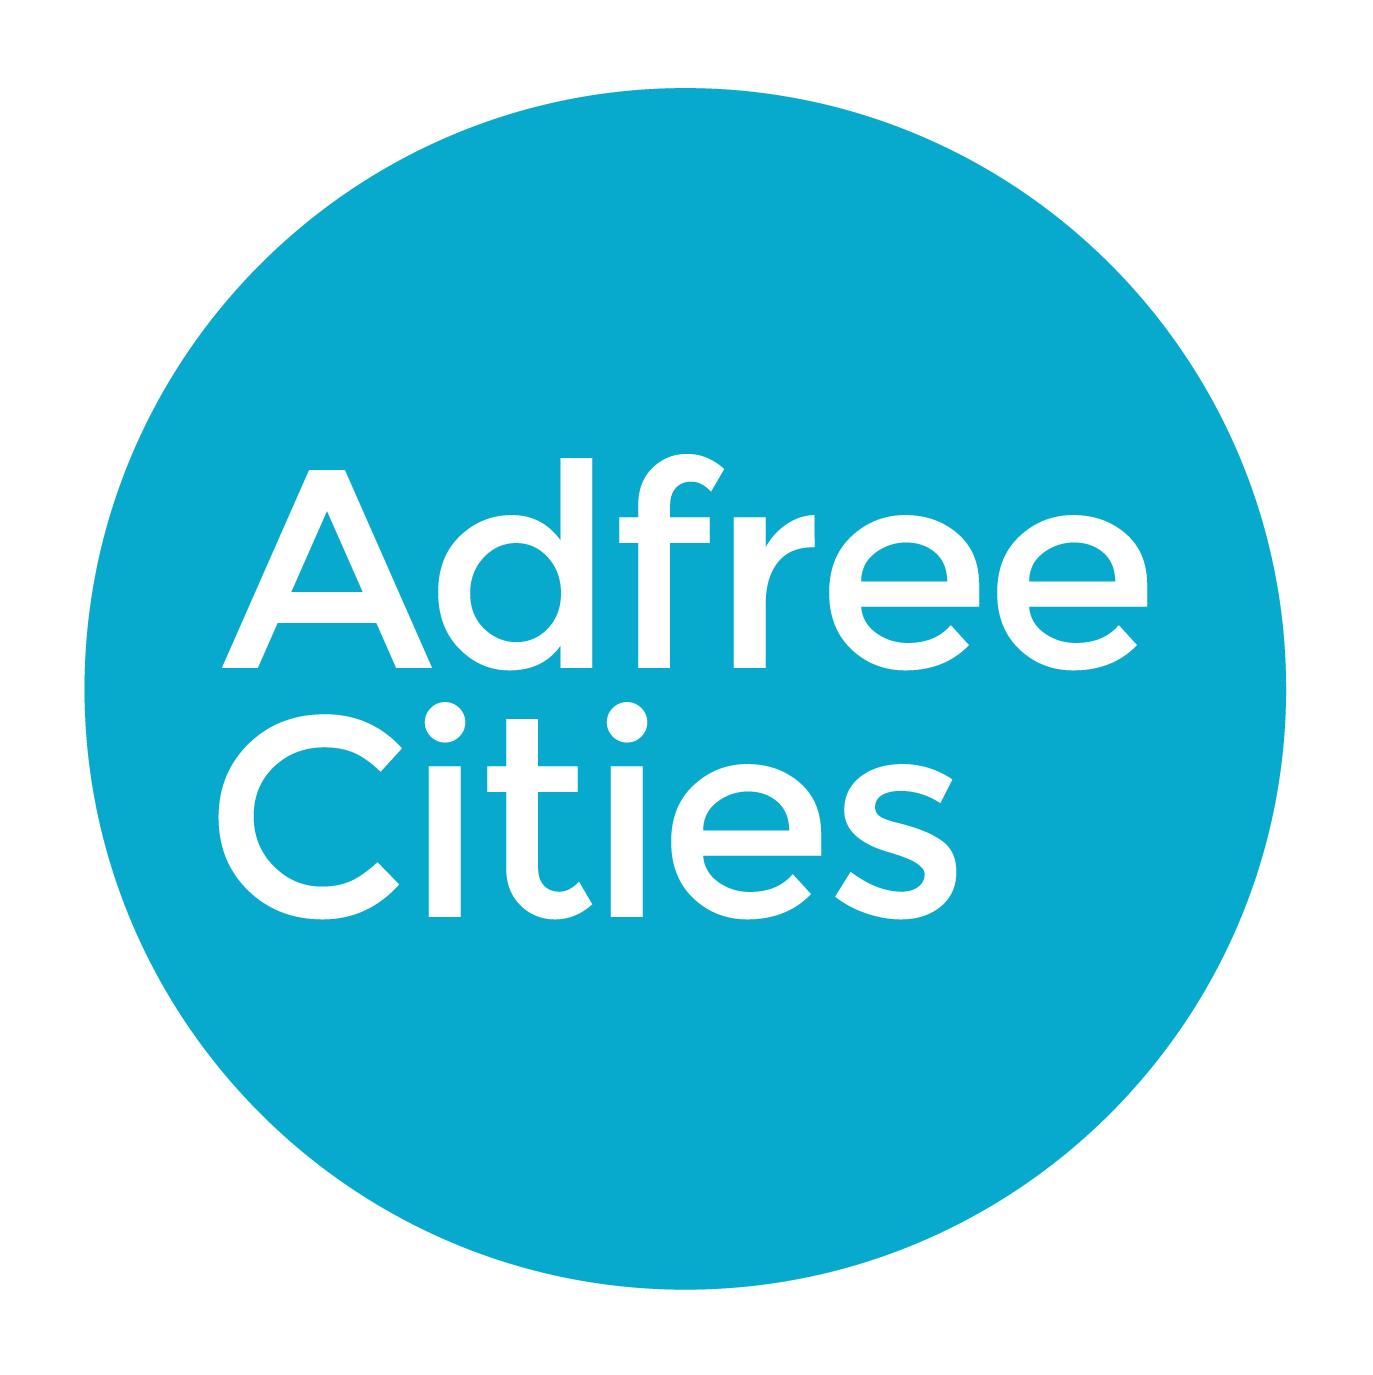 Ad free Cities logo